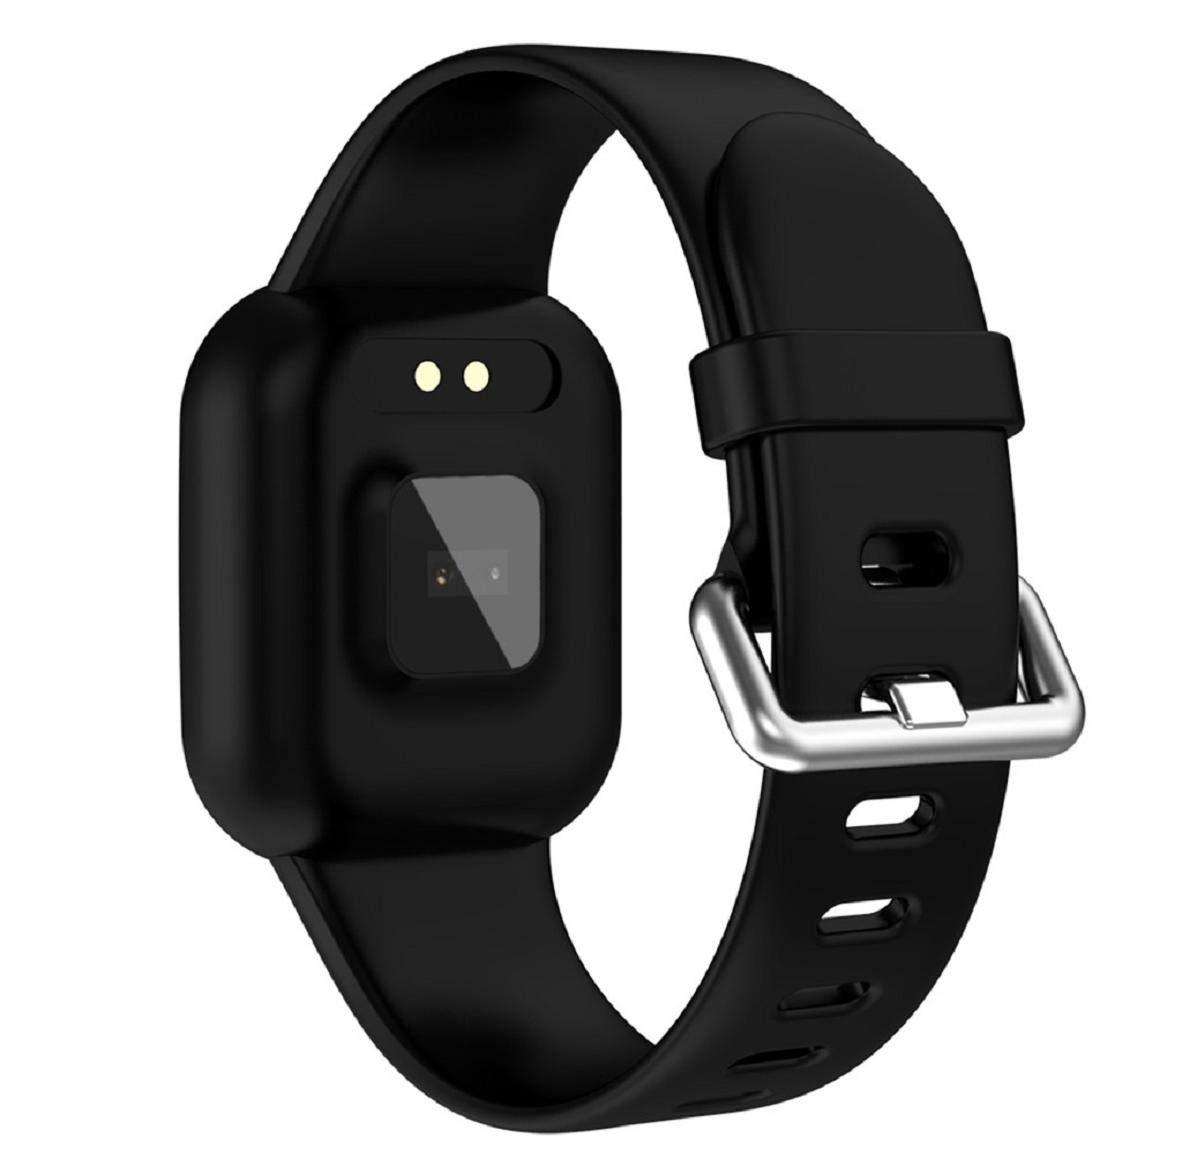 Amazon.com: Boddenly Reloj Inteligente, Pantalla Táctil ...